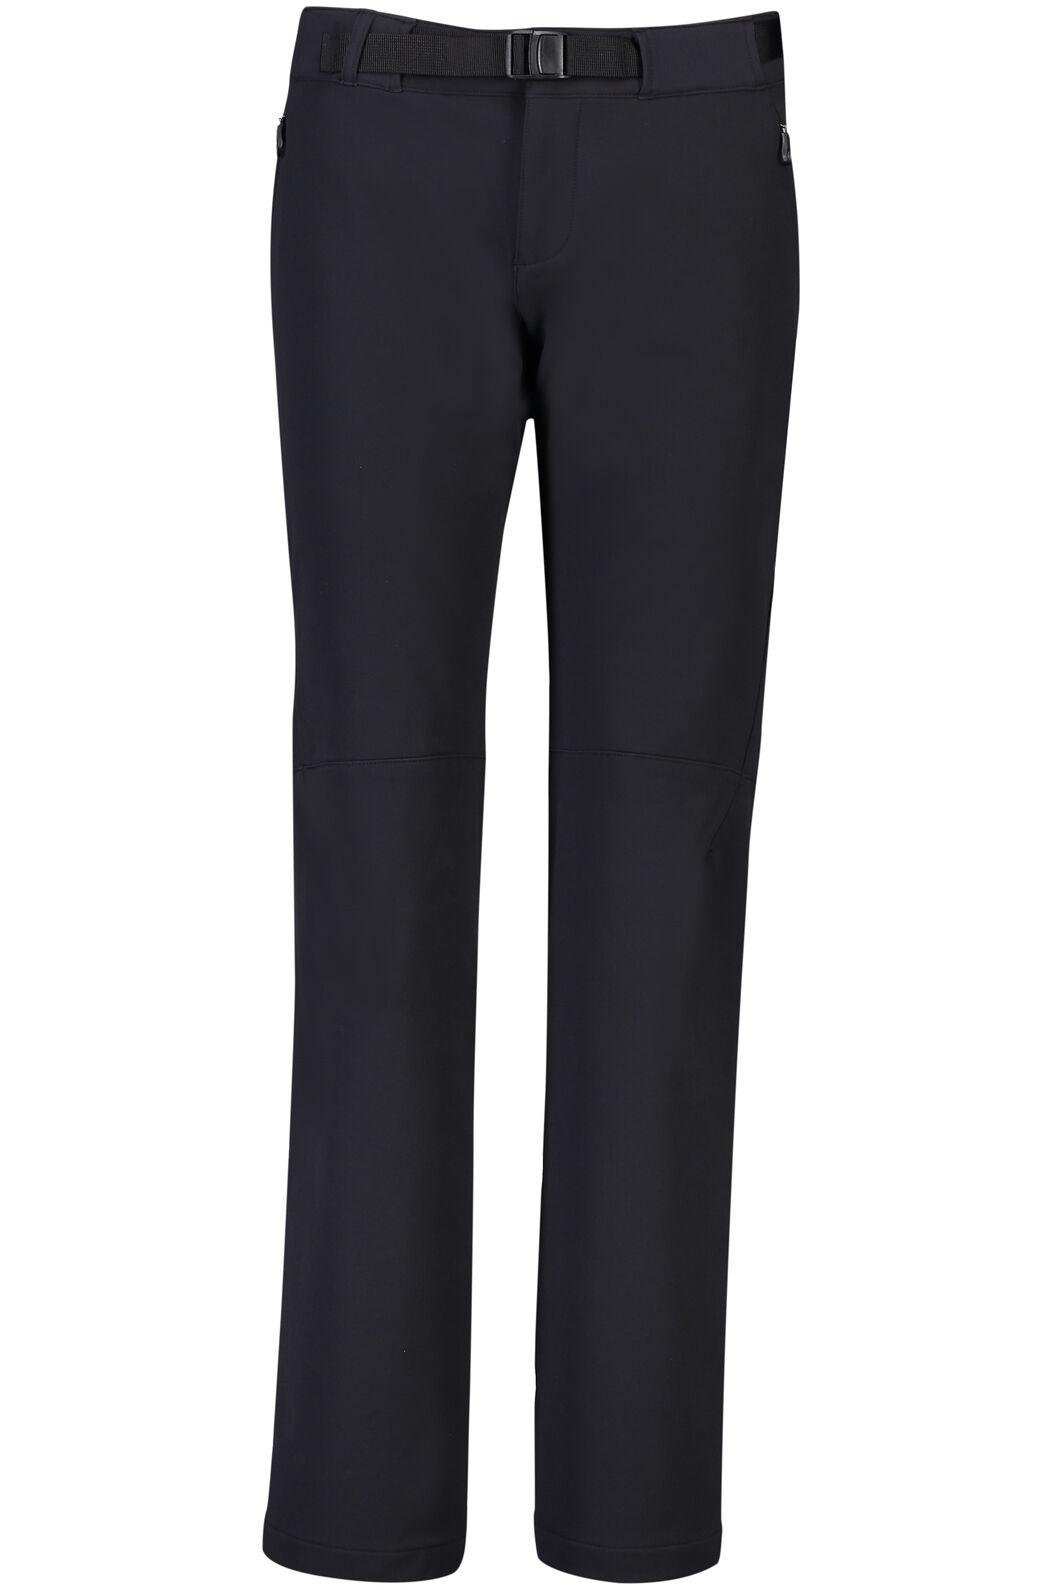 Macpac Nemesis Softshell Pants - Women's, Black, hi-res